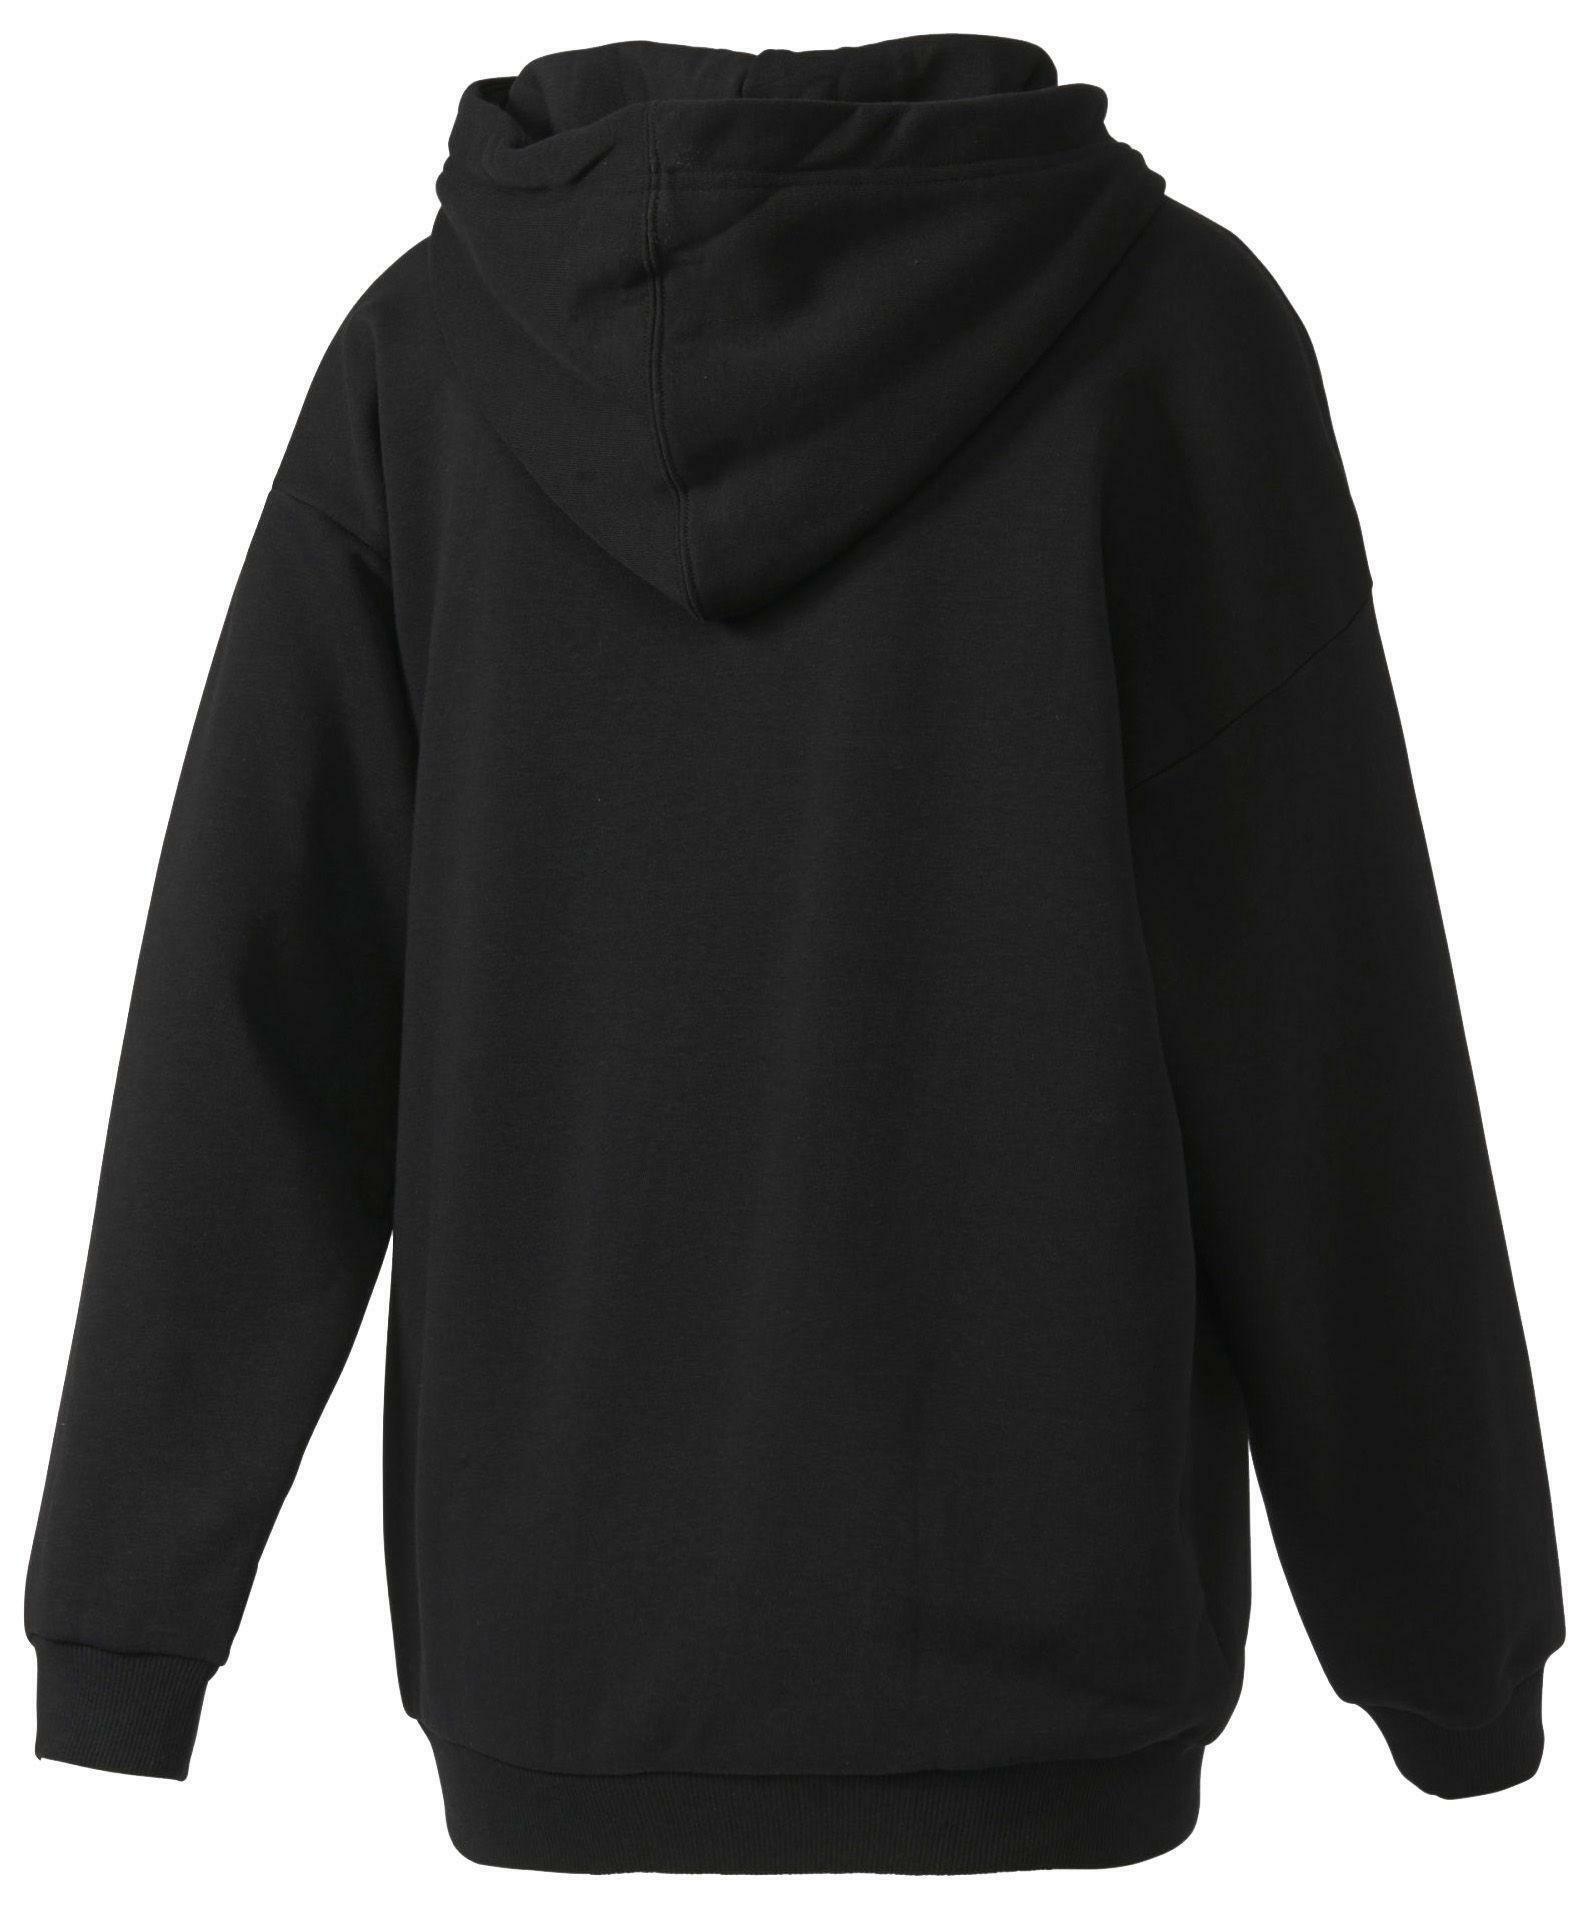 adidas adidas trefoil hoodie felpa donna nera